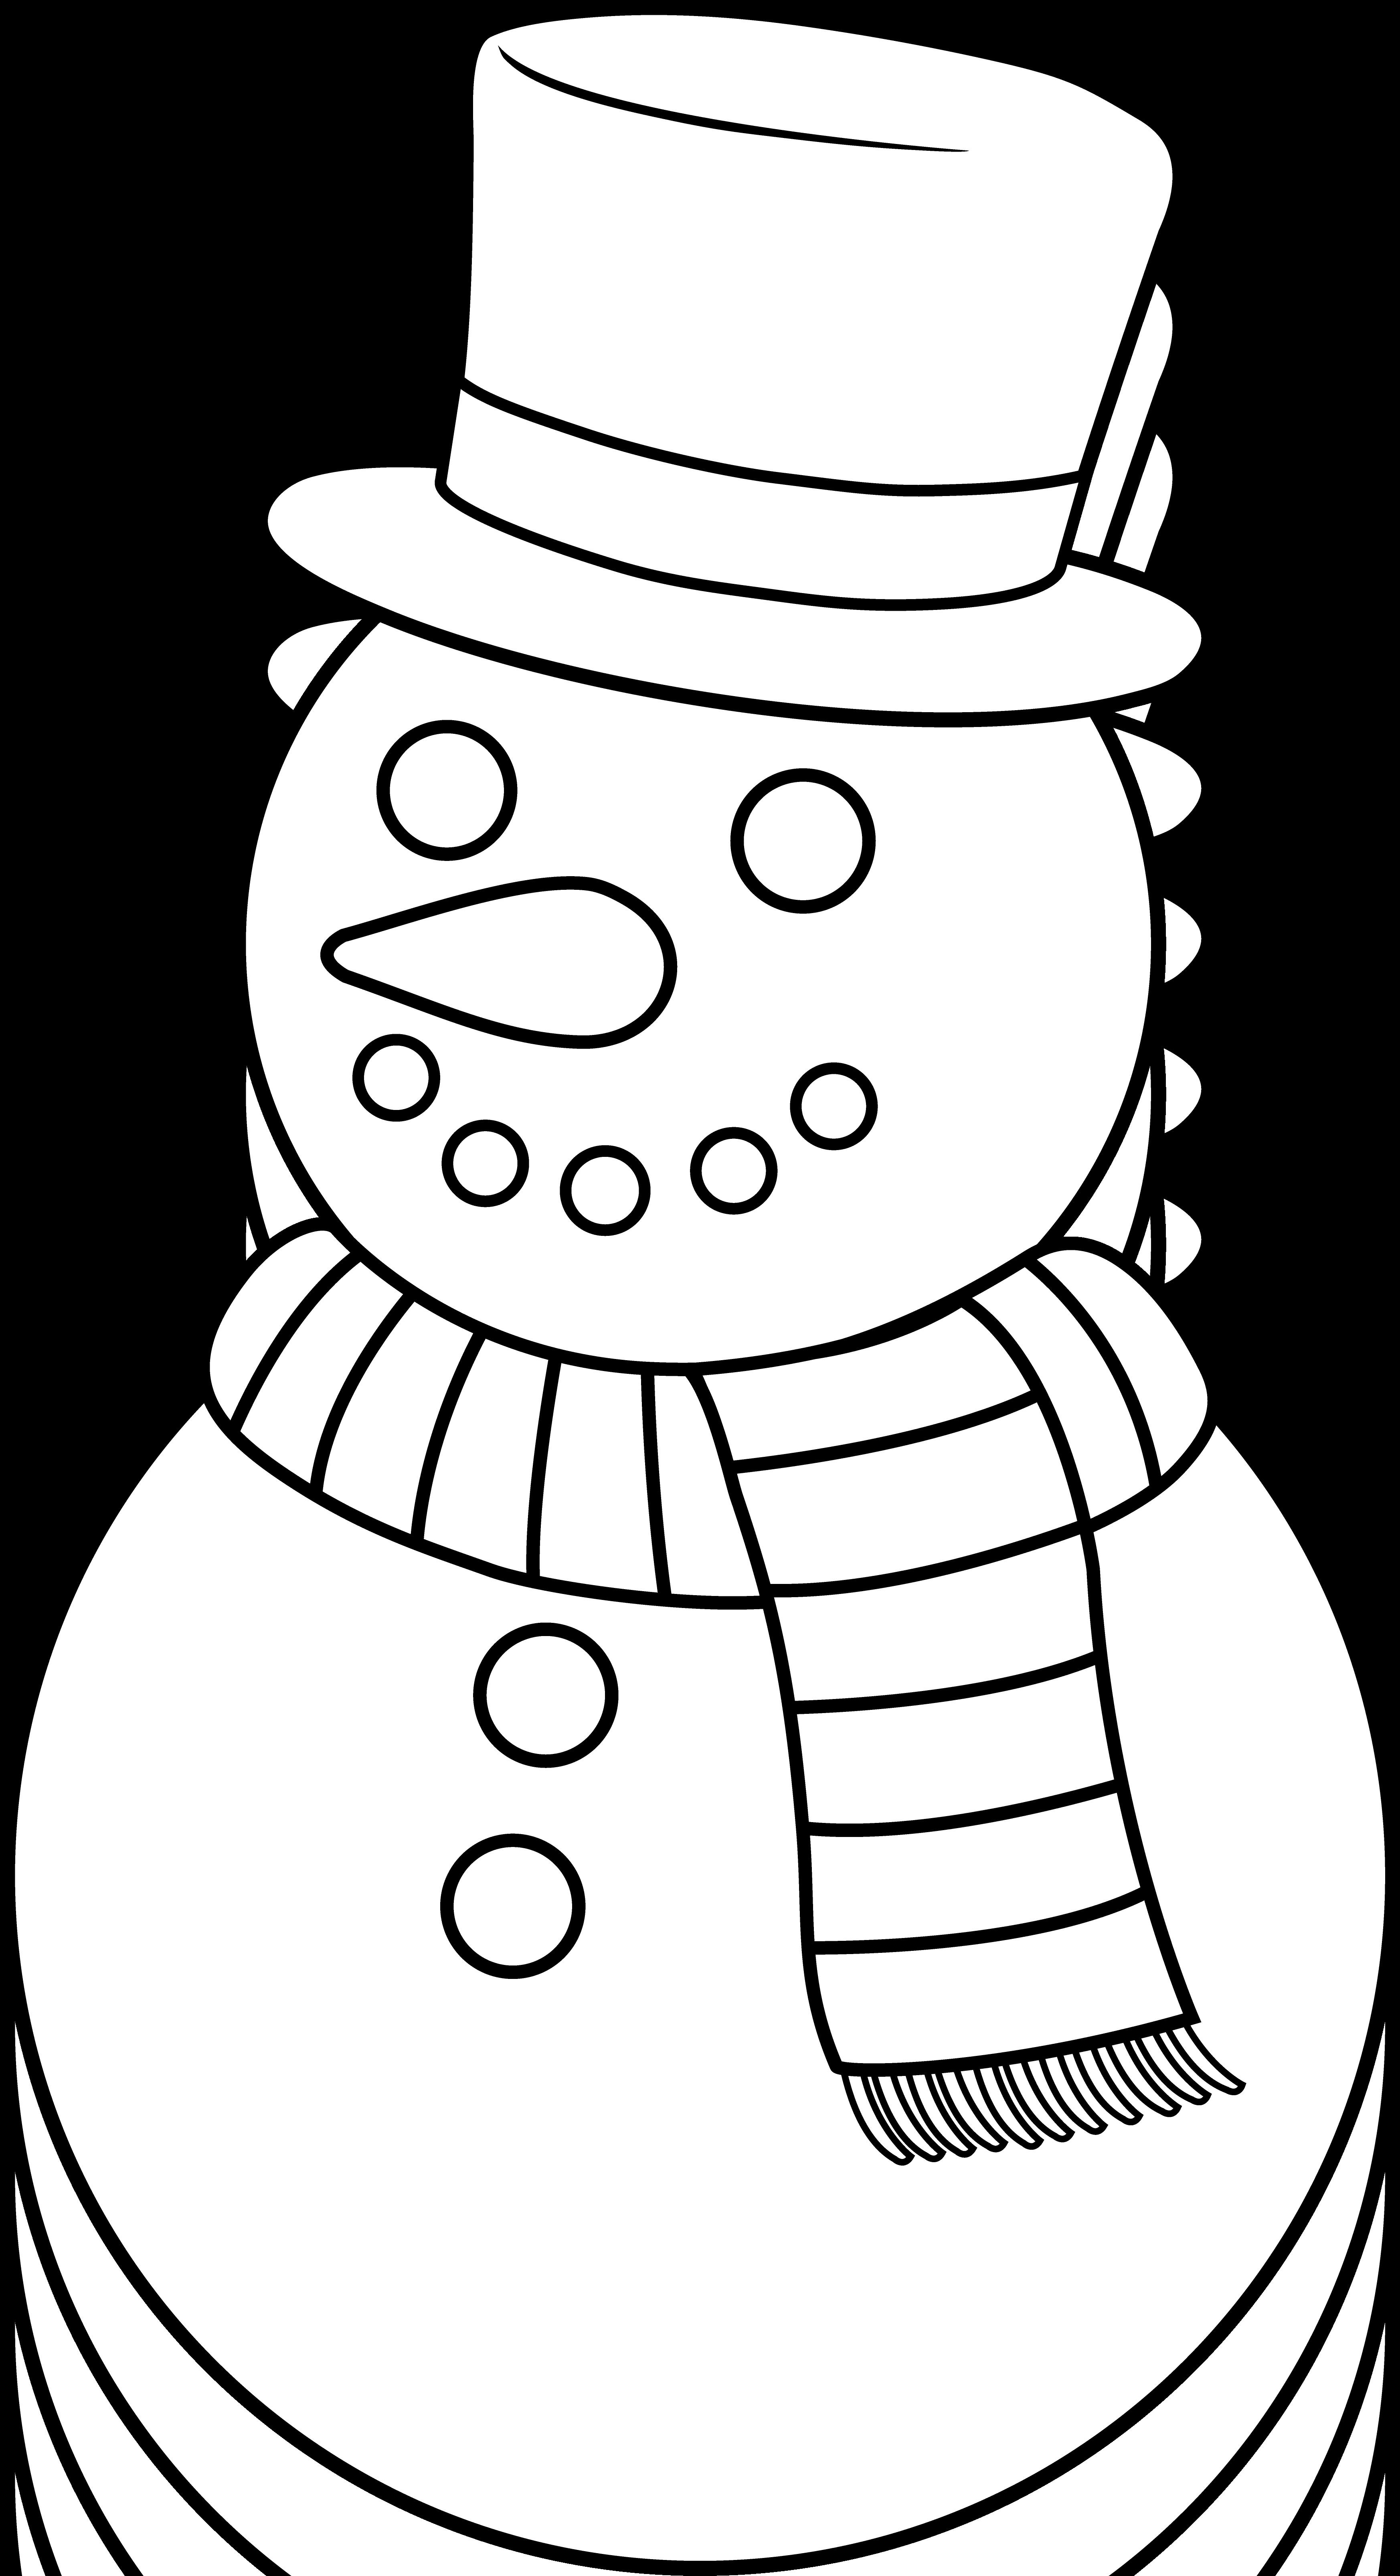 Colorable Christmas Snowman.